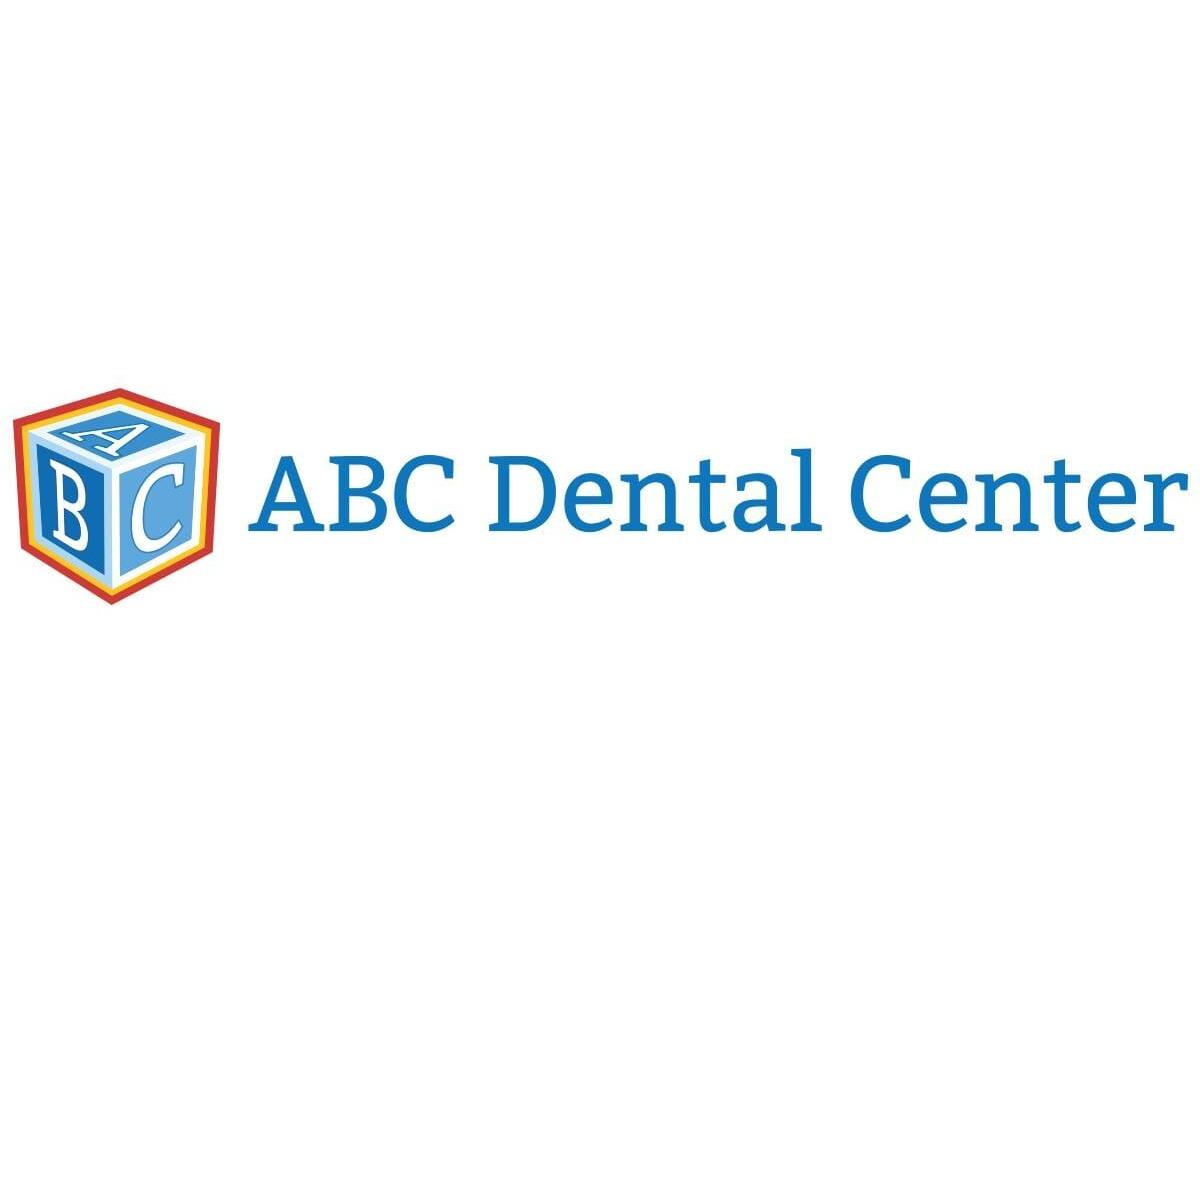 ABC Dental Center